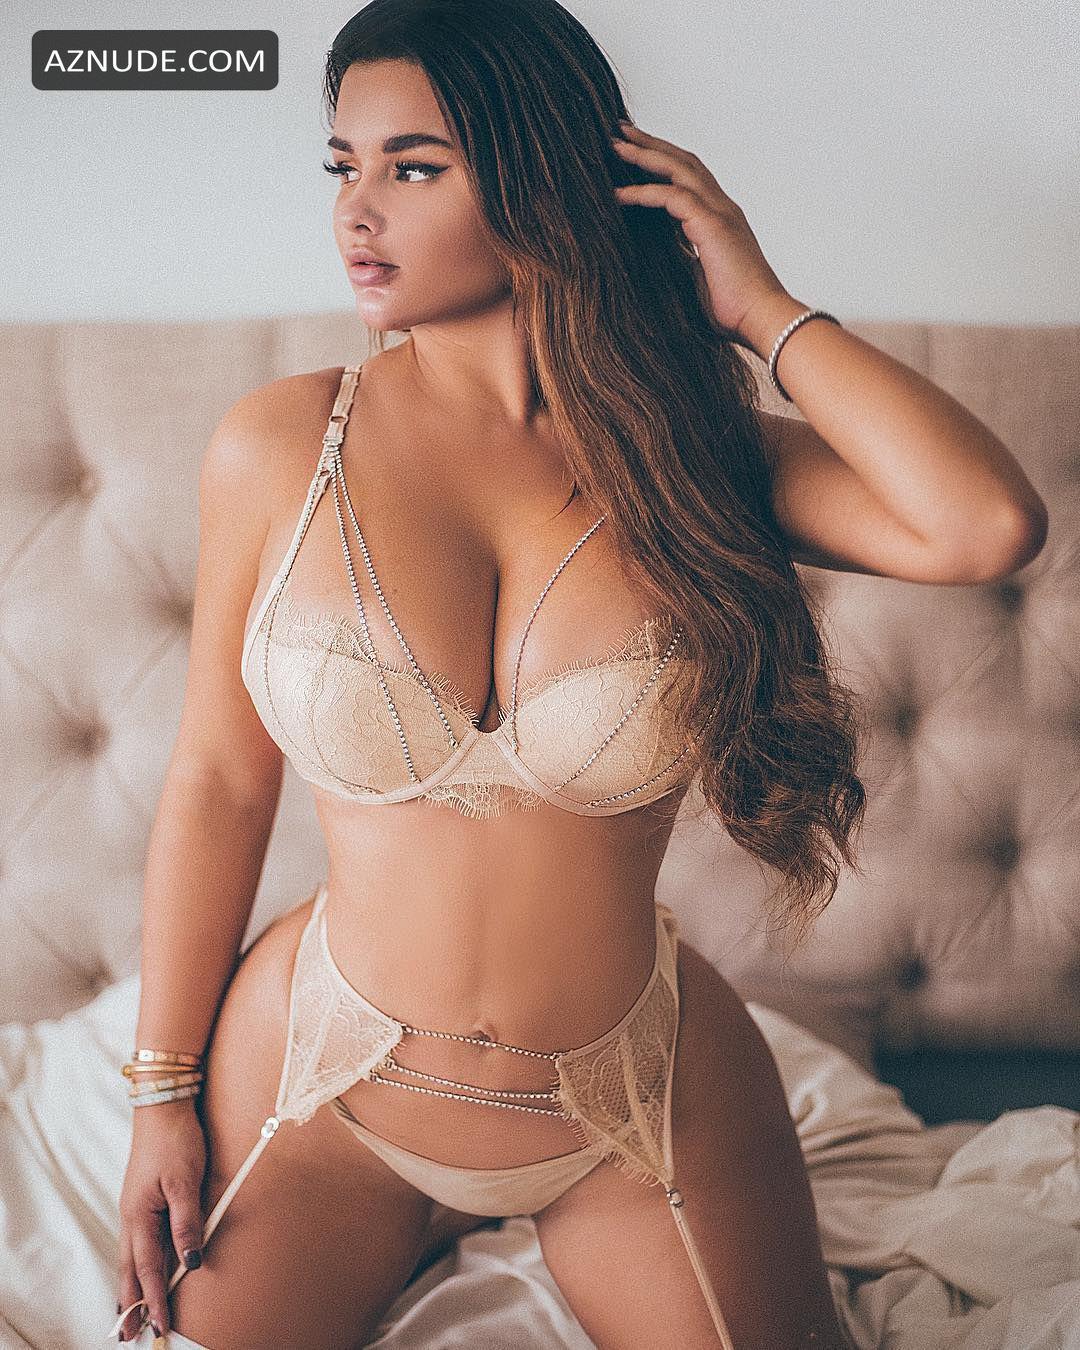 Anastasiya Kvitko Xxx download sex pics anastasiya kvitko nude naked pics and